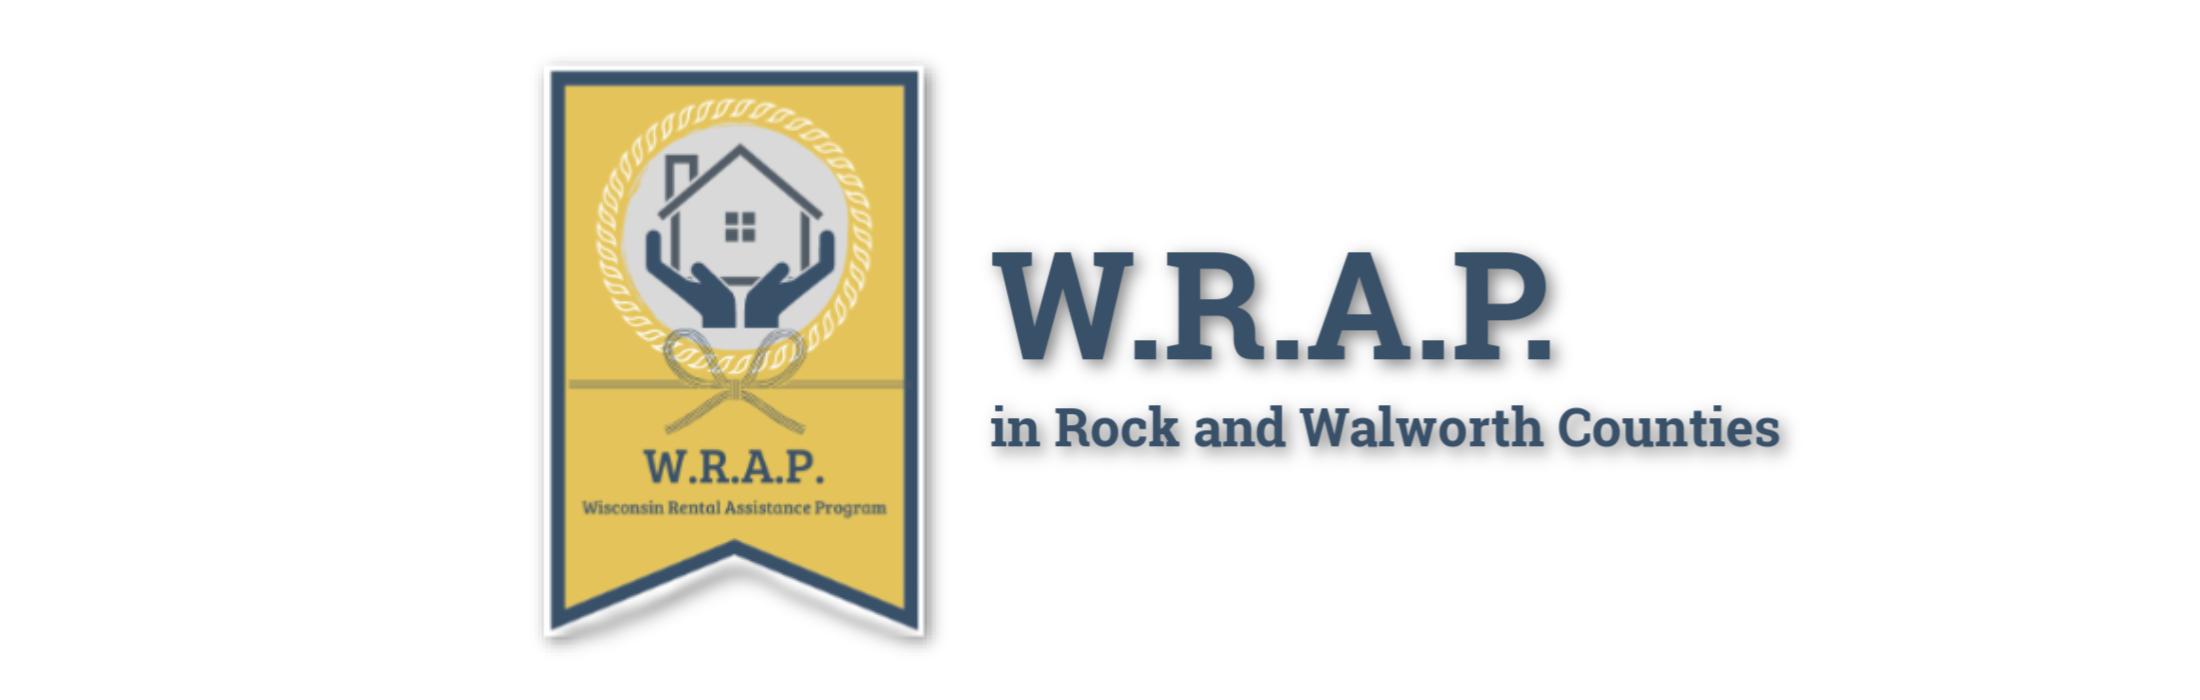 UPDATED-CAI-WRAP-slider-1